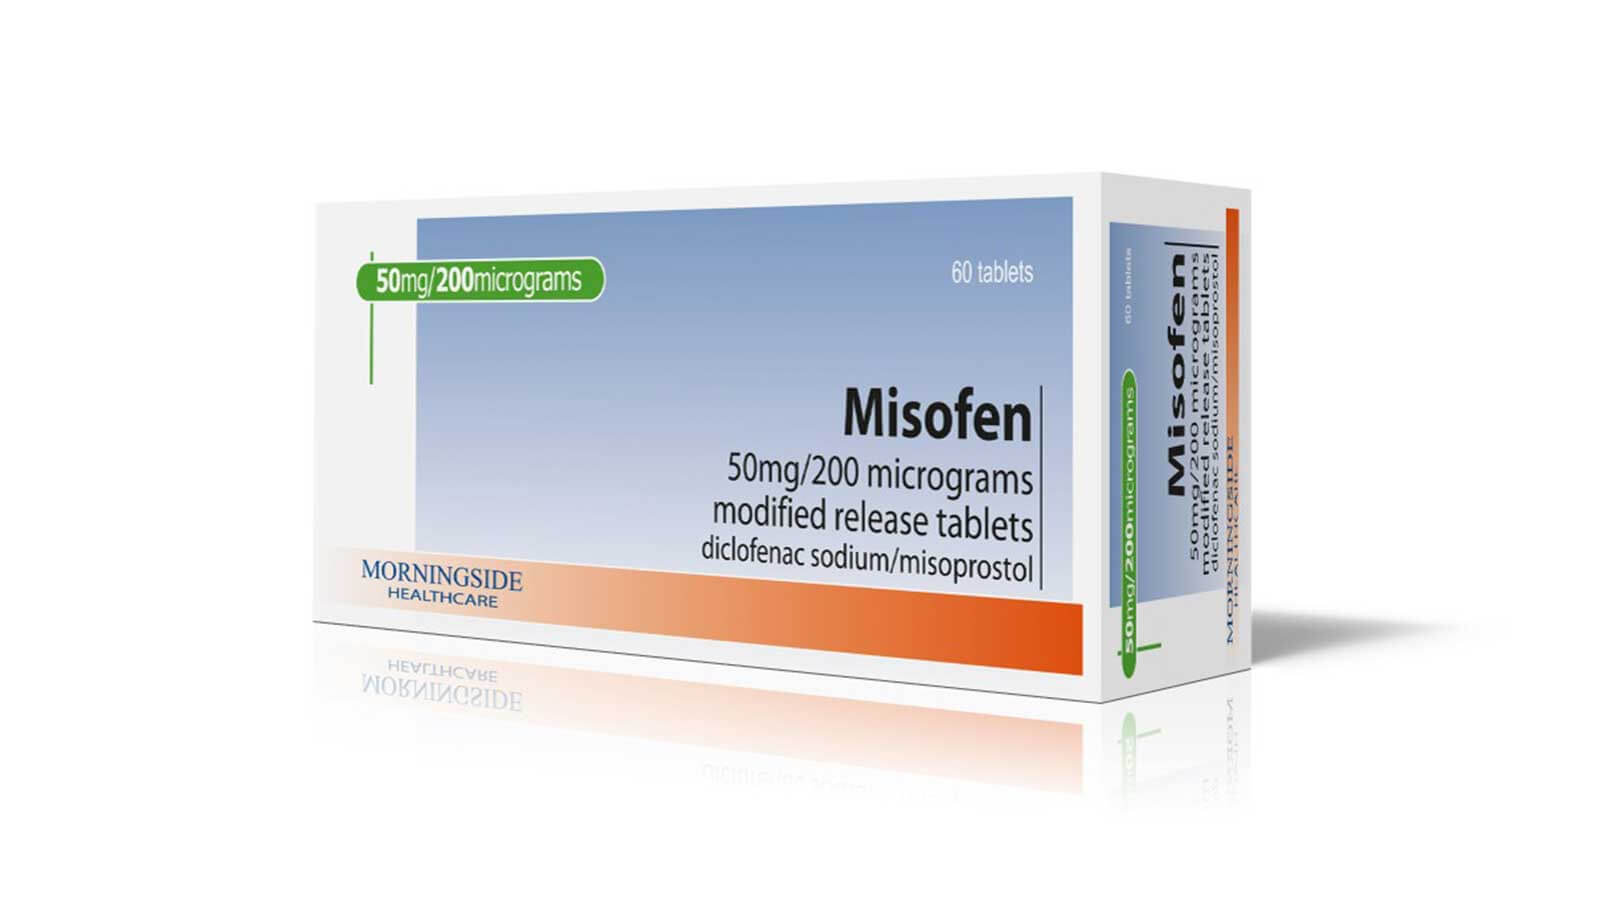 Diclofenac / Misoprostol (Misofen)